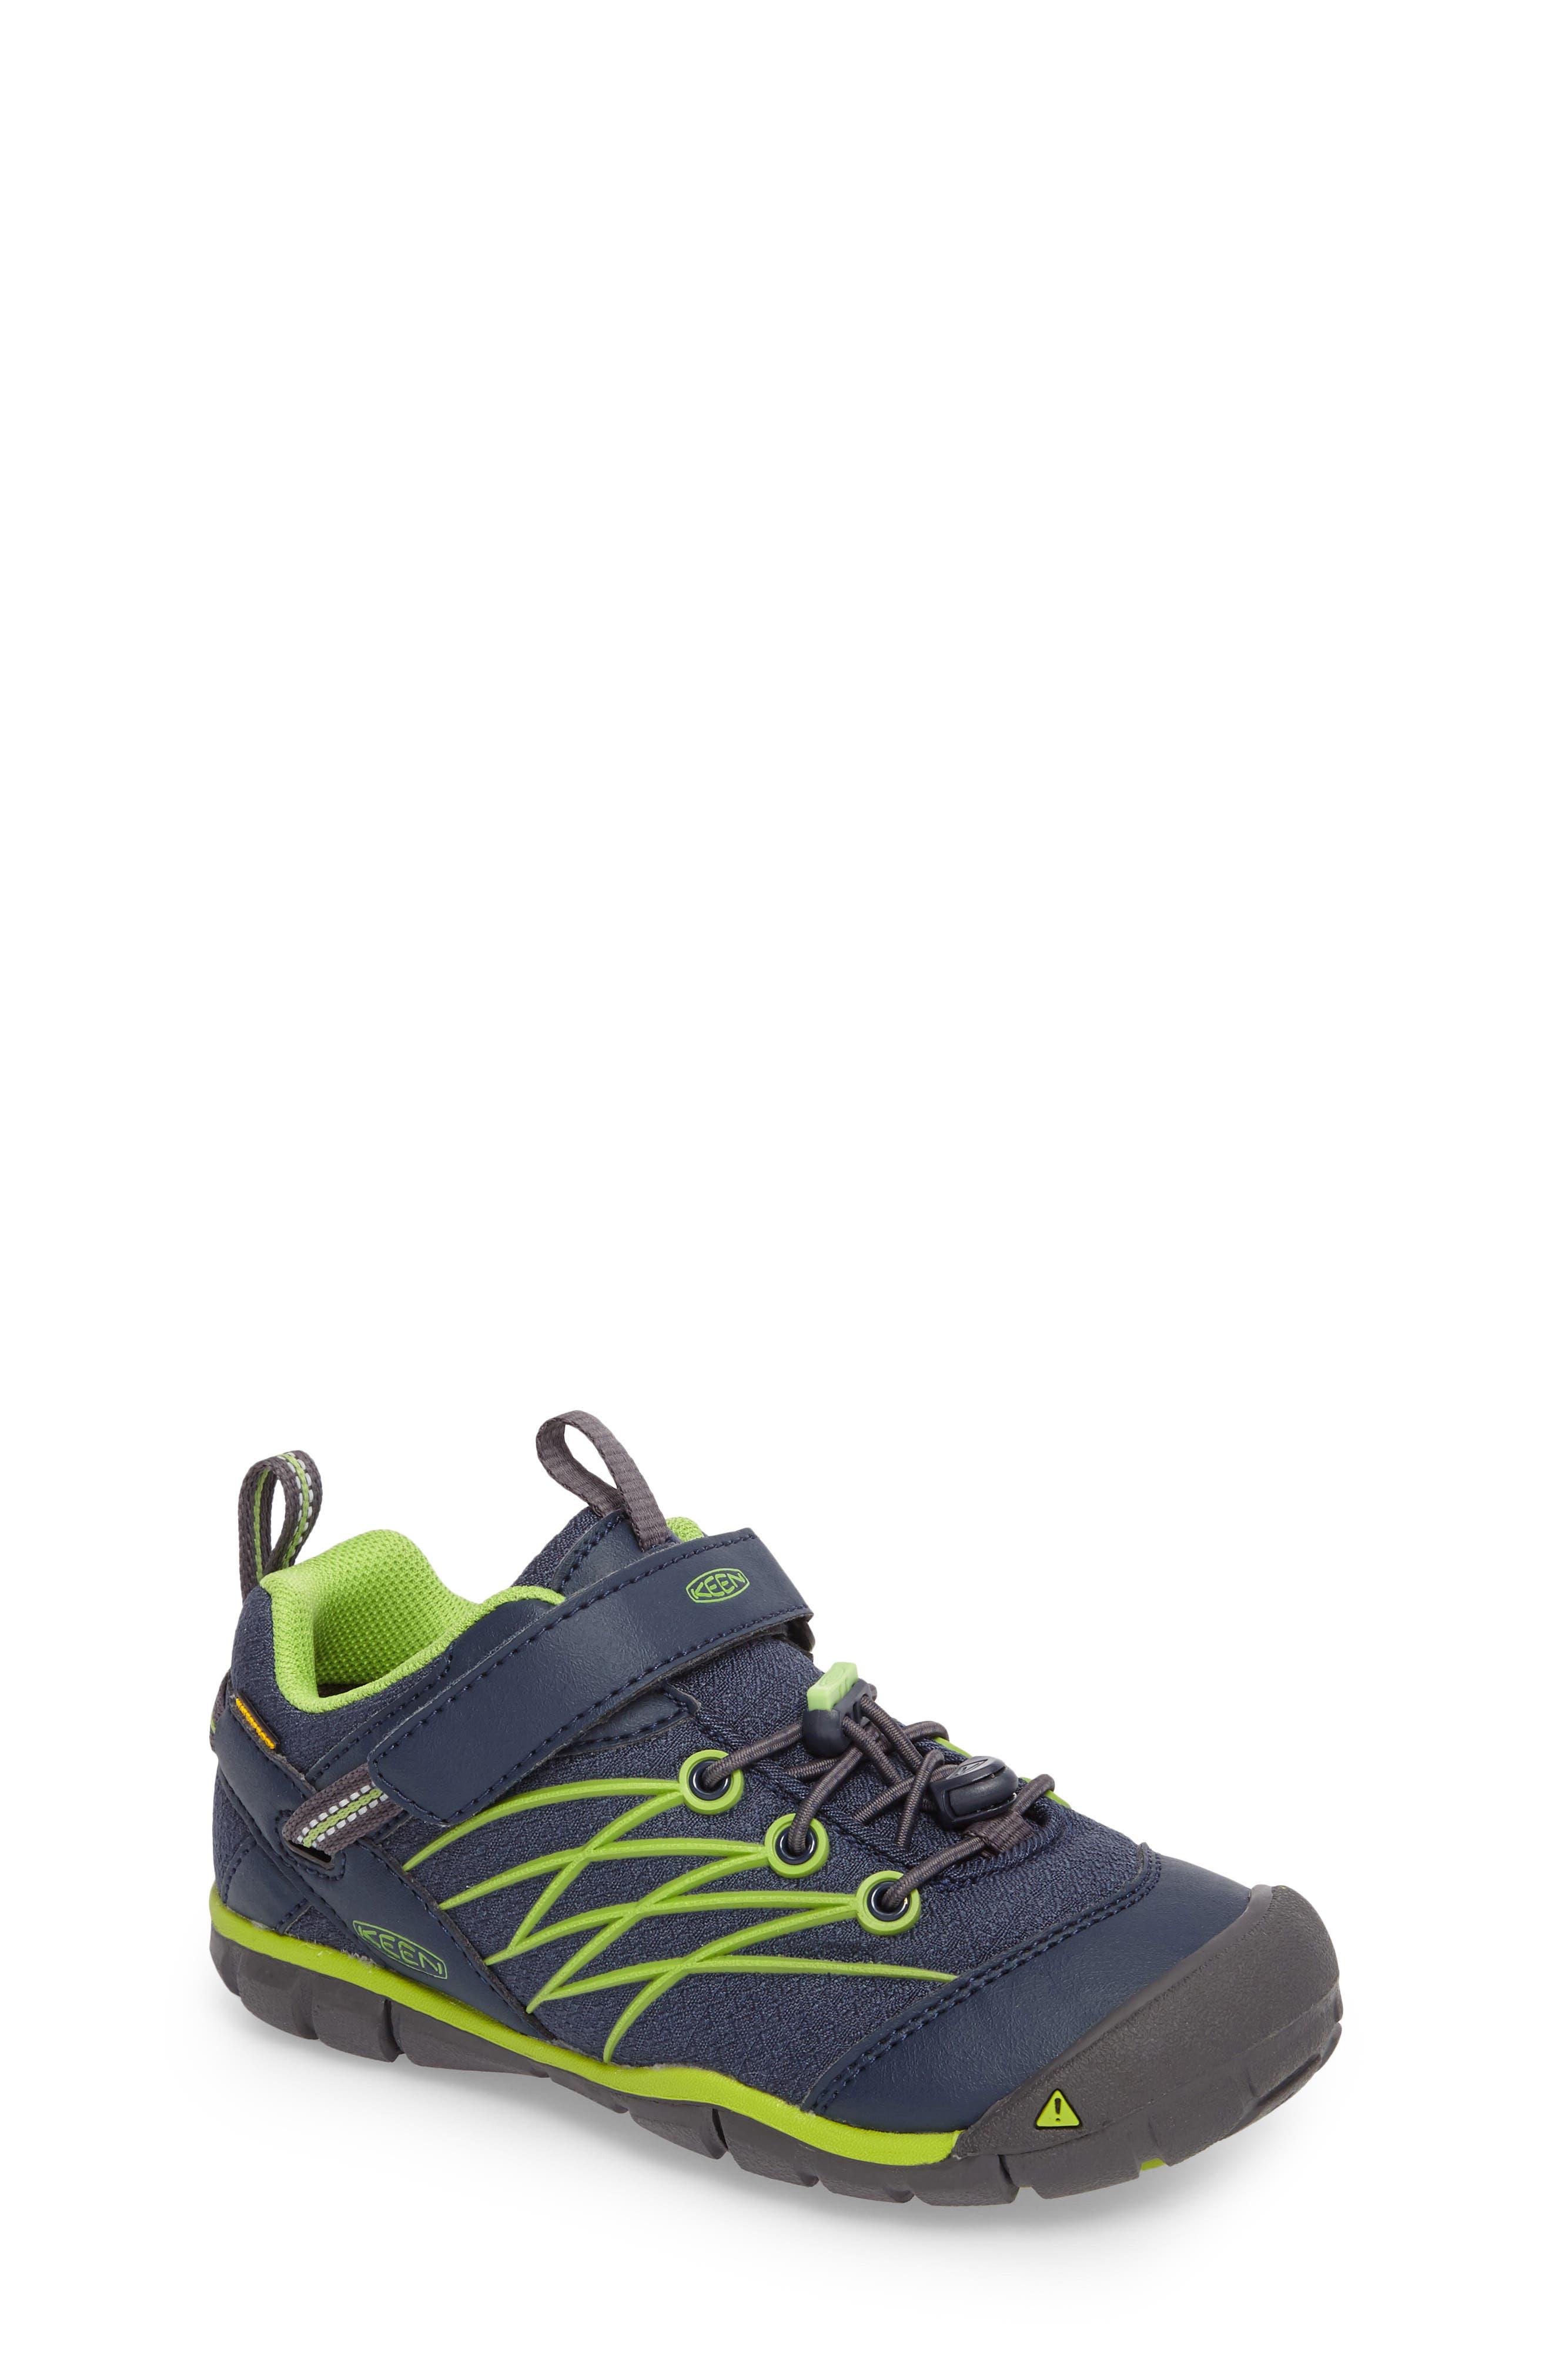 Chandler CNX Waterproof Sneaker,                             Main thumbnail 1, color,                             Dress Blues/ Greenery